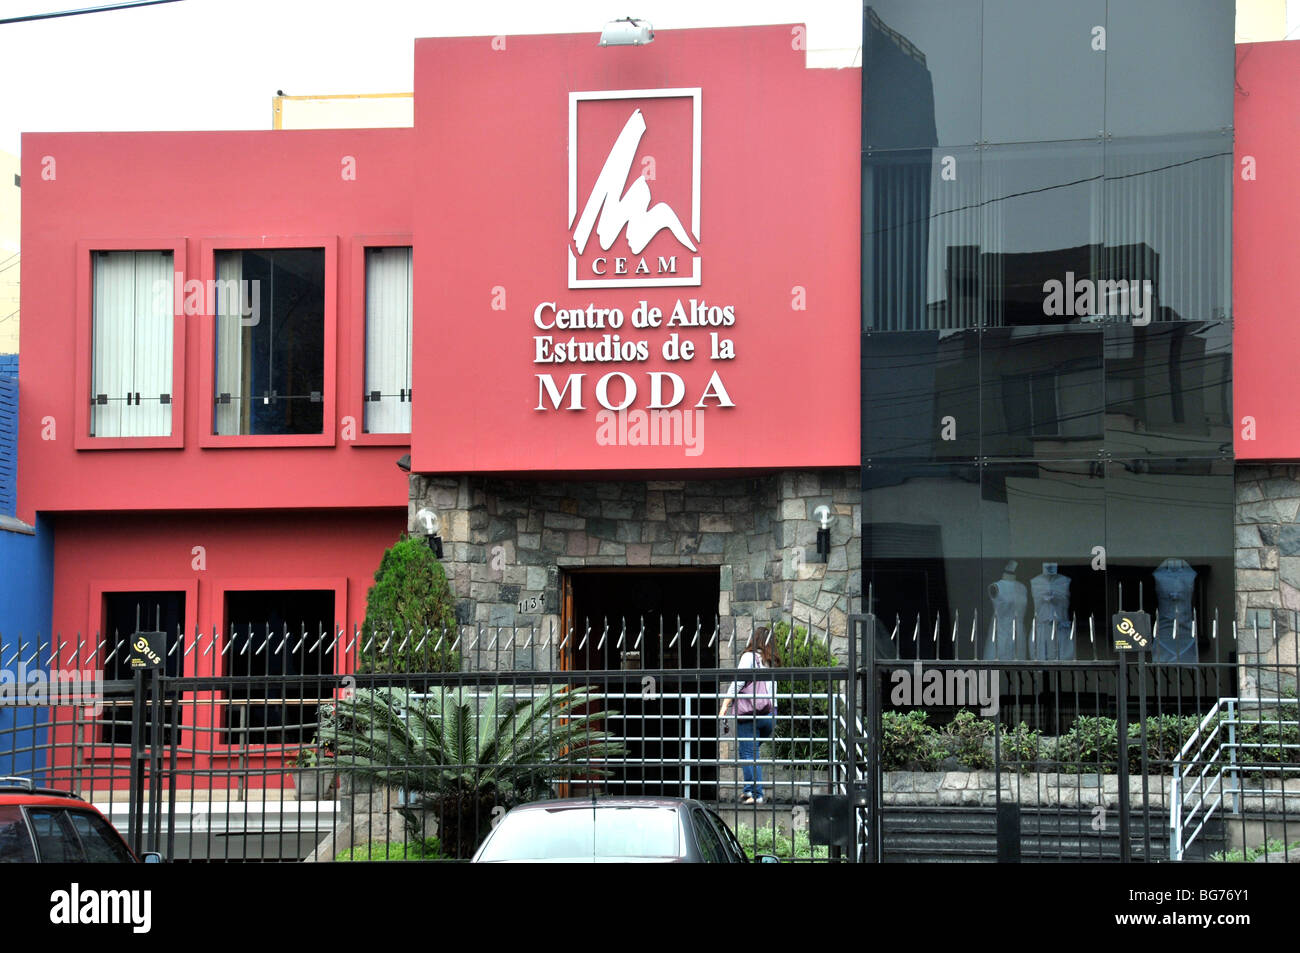 Centro de Altos Estudios de la moda, Miraflores Lima, Perù Immagini Stock